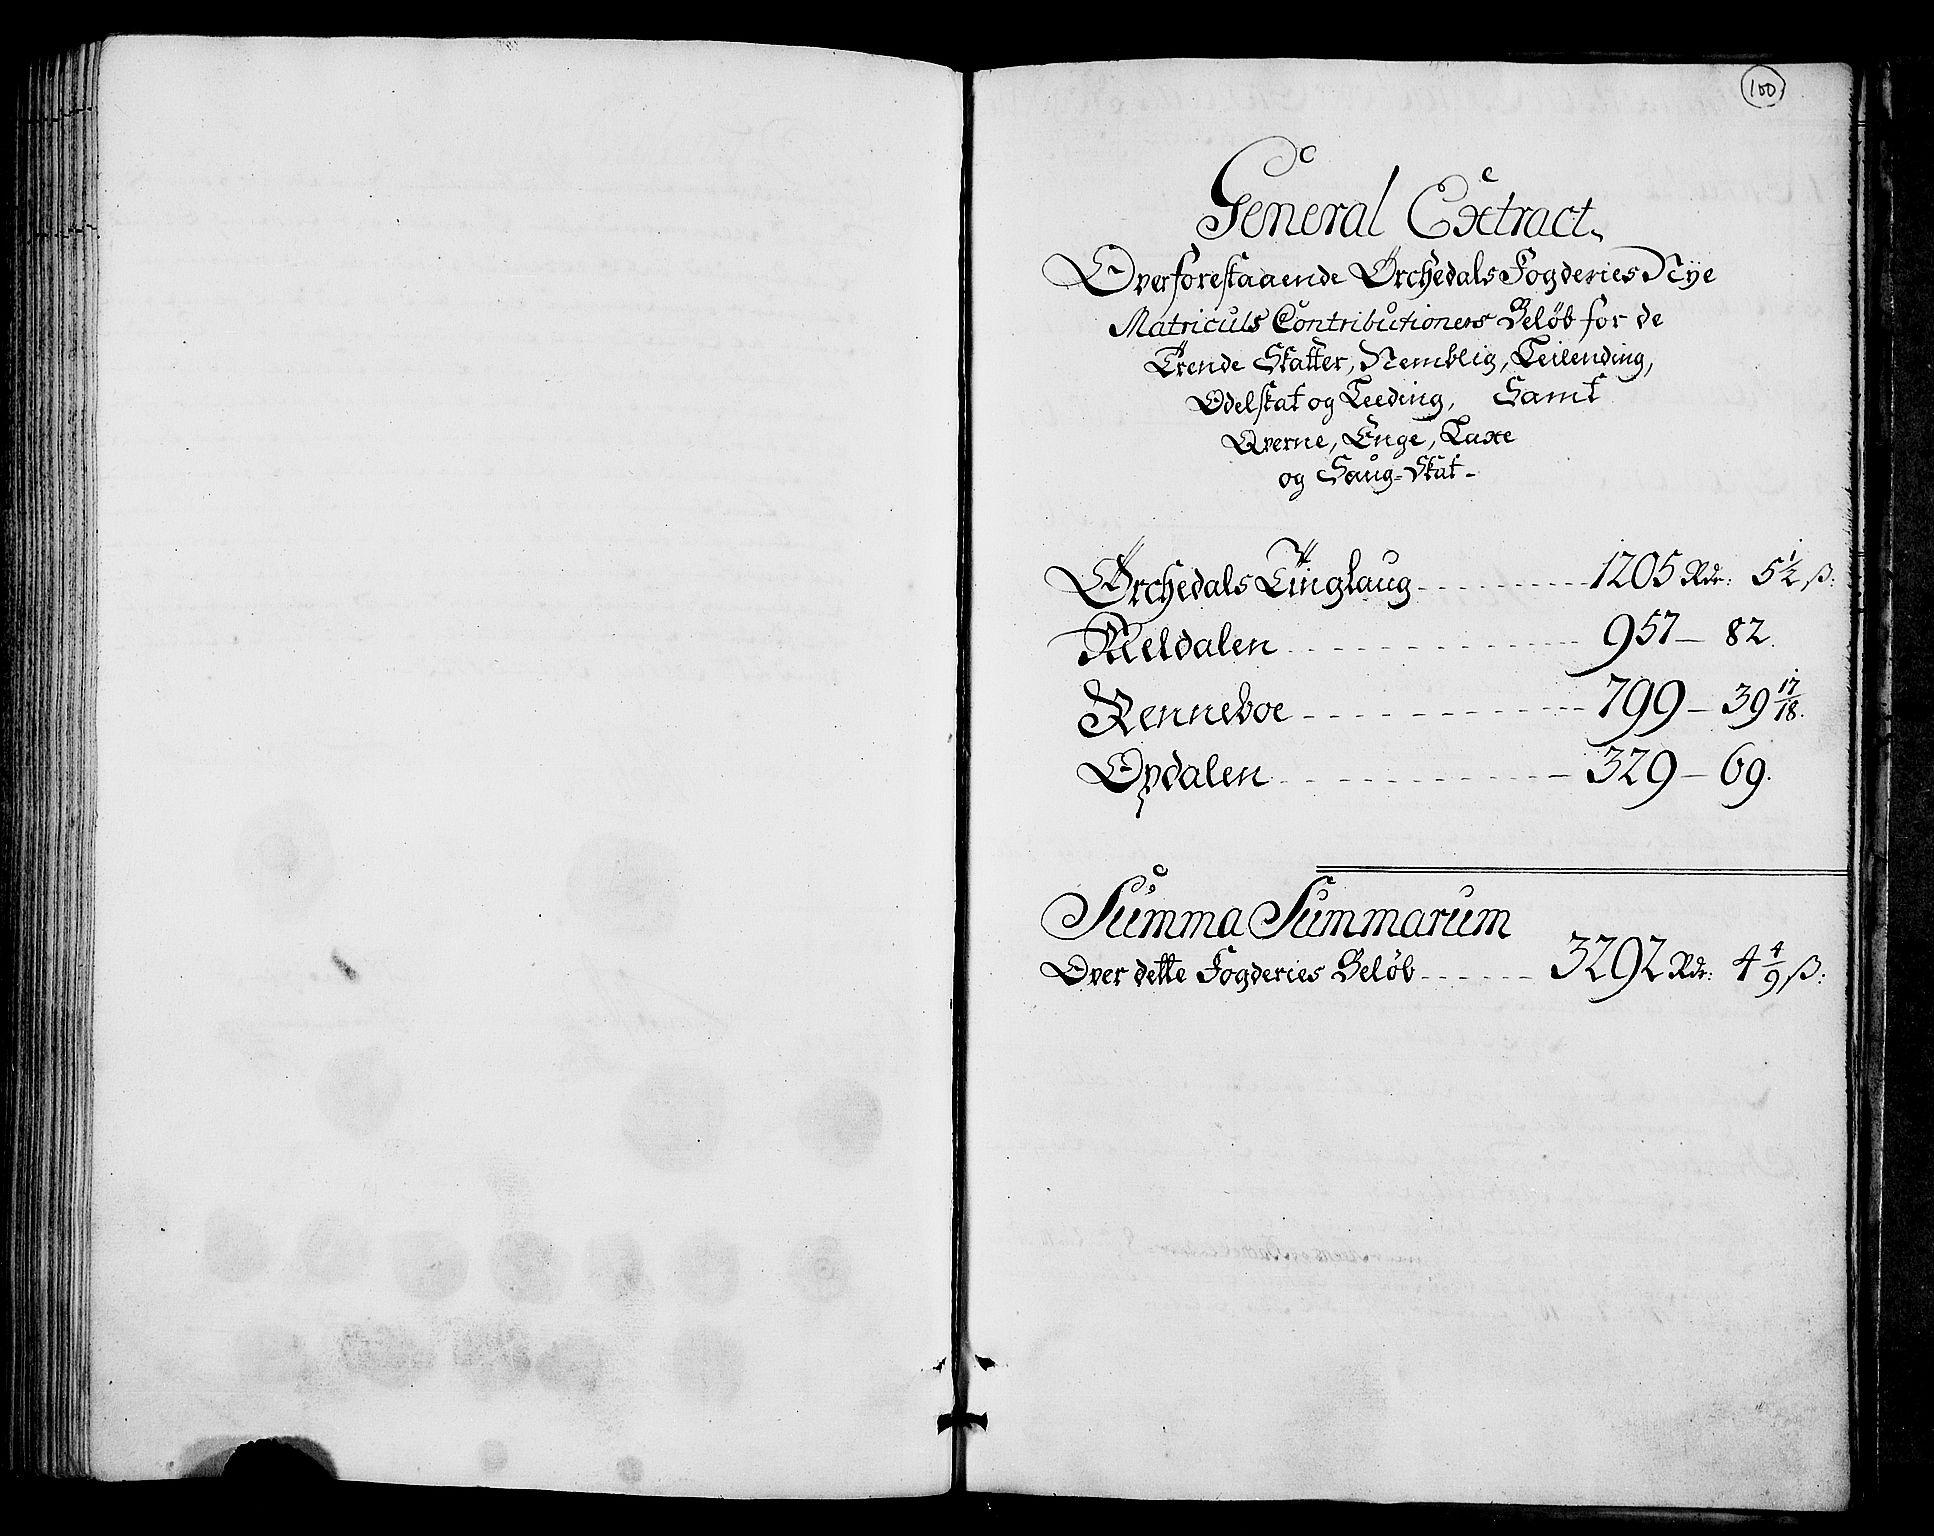 RA, Rentekammeret inntil 1814, Realistisk ordnet avdeling, N/Nb/Nbf/L0157: Orkdal matrikkelprotokoll, 1723, s. 99b-100a